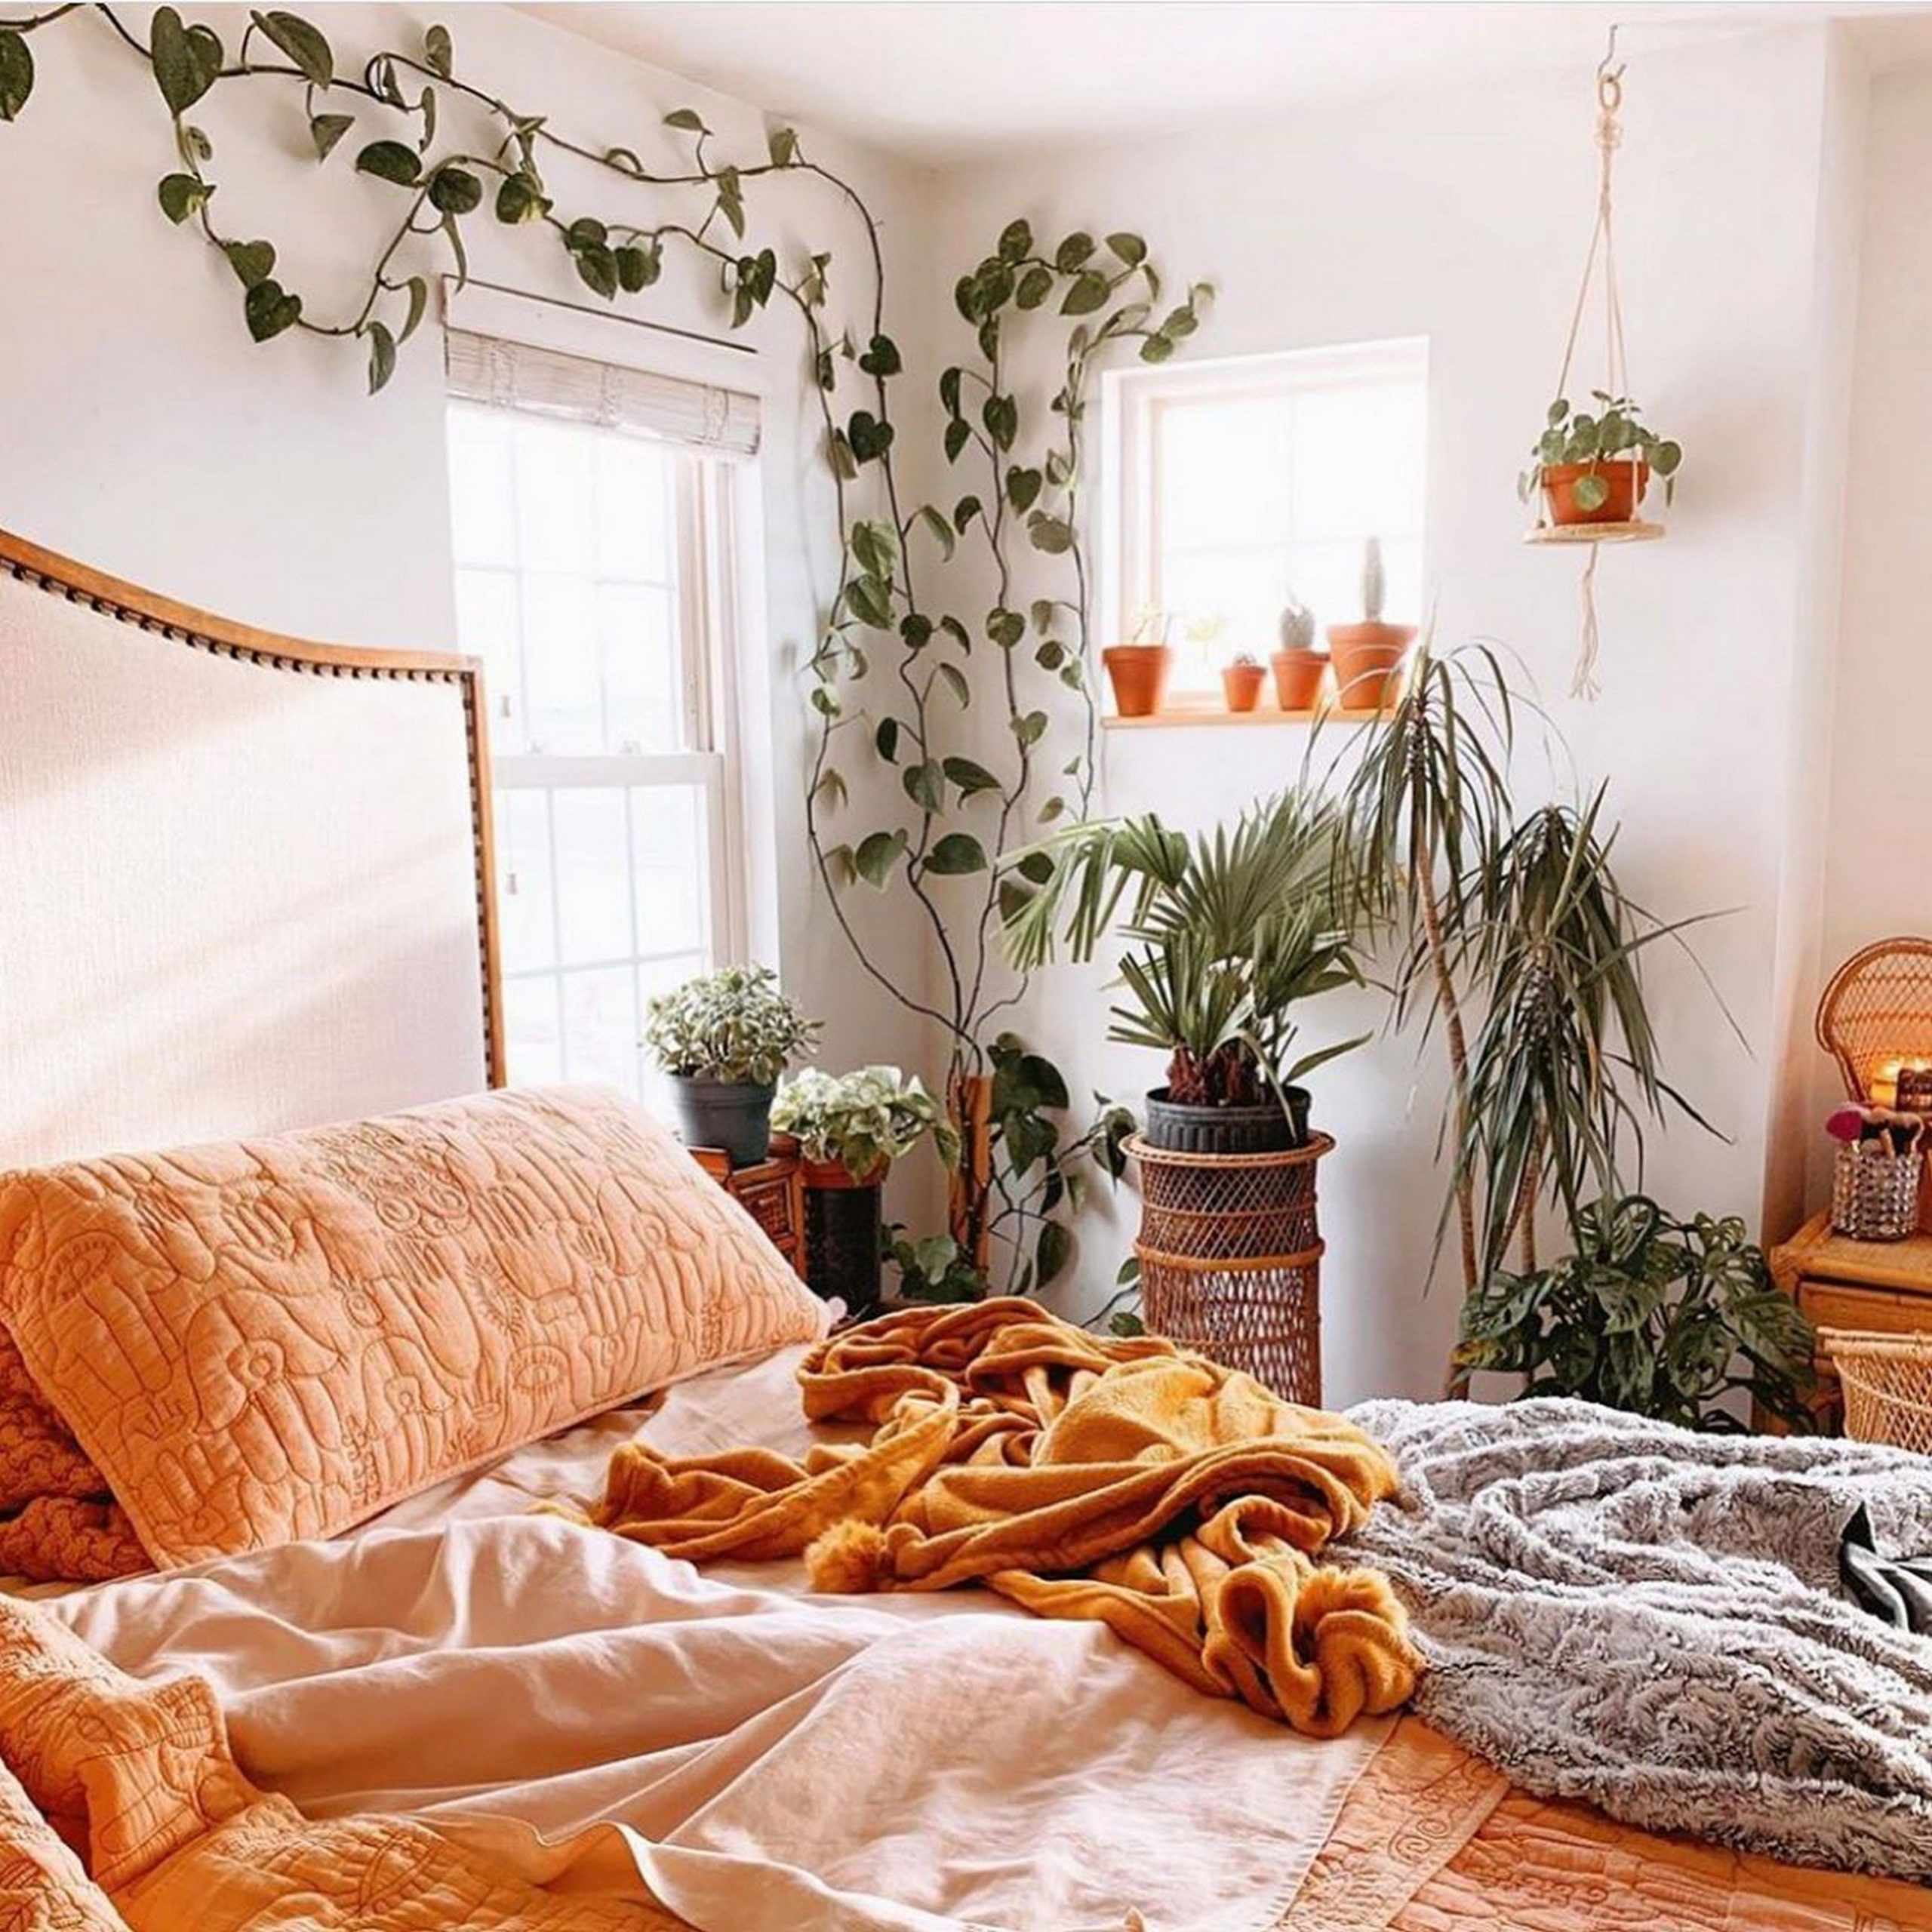 Bohemian Bedroom #bedroom ideas for small rooms bohemian ...